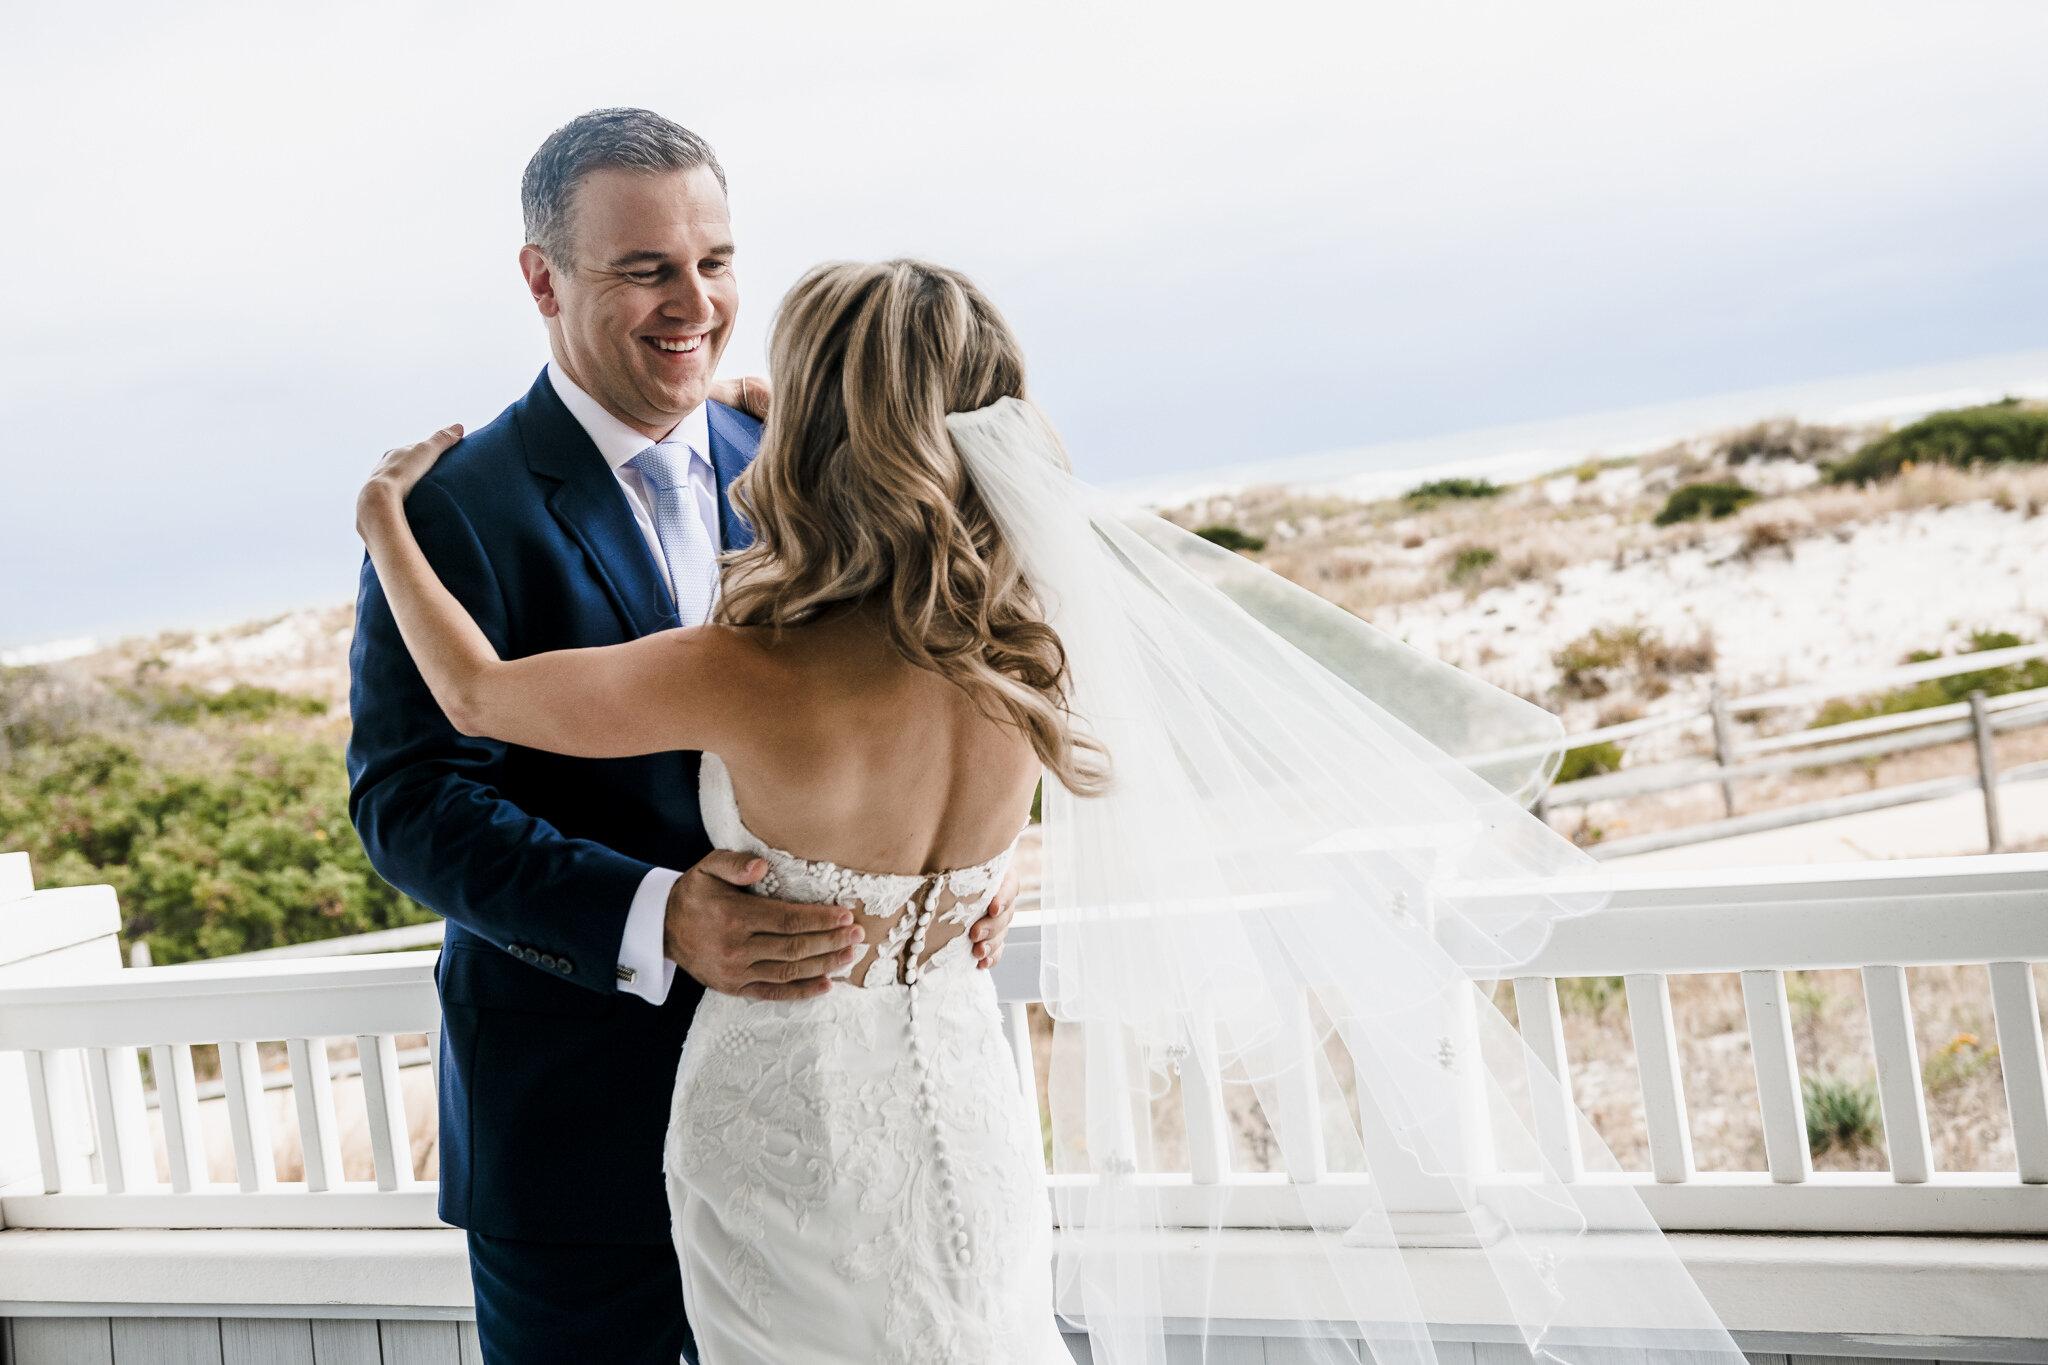 Snell-Ocean-City-Yacht-Club-New-Jersey-Wedding-Photographer-08.JPG